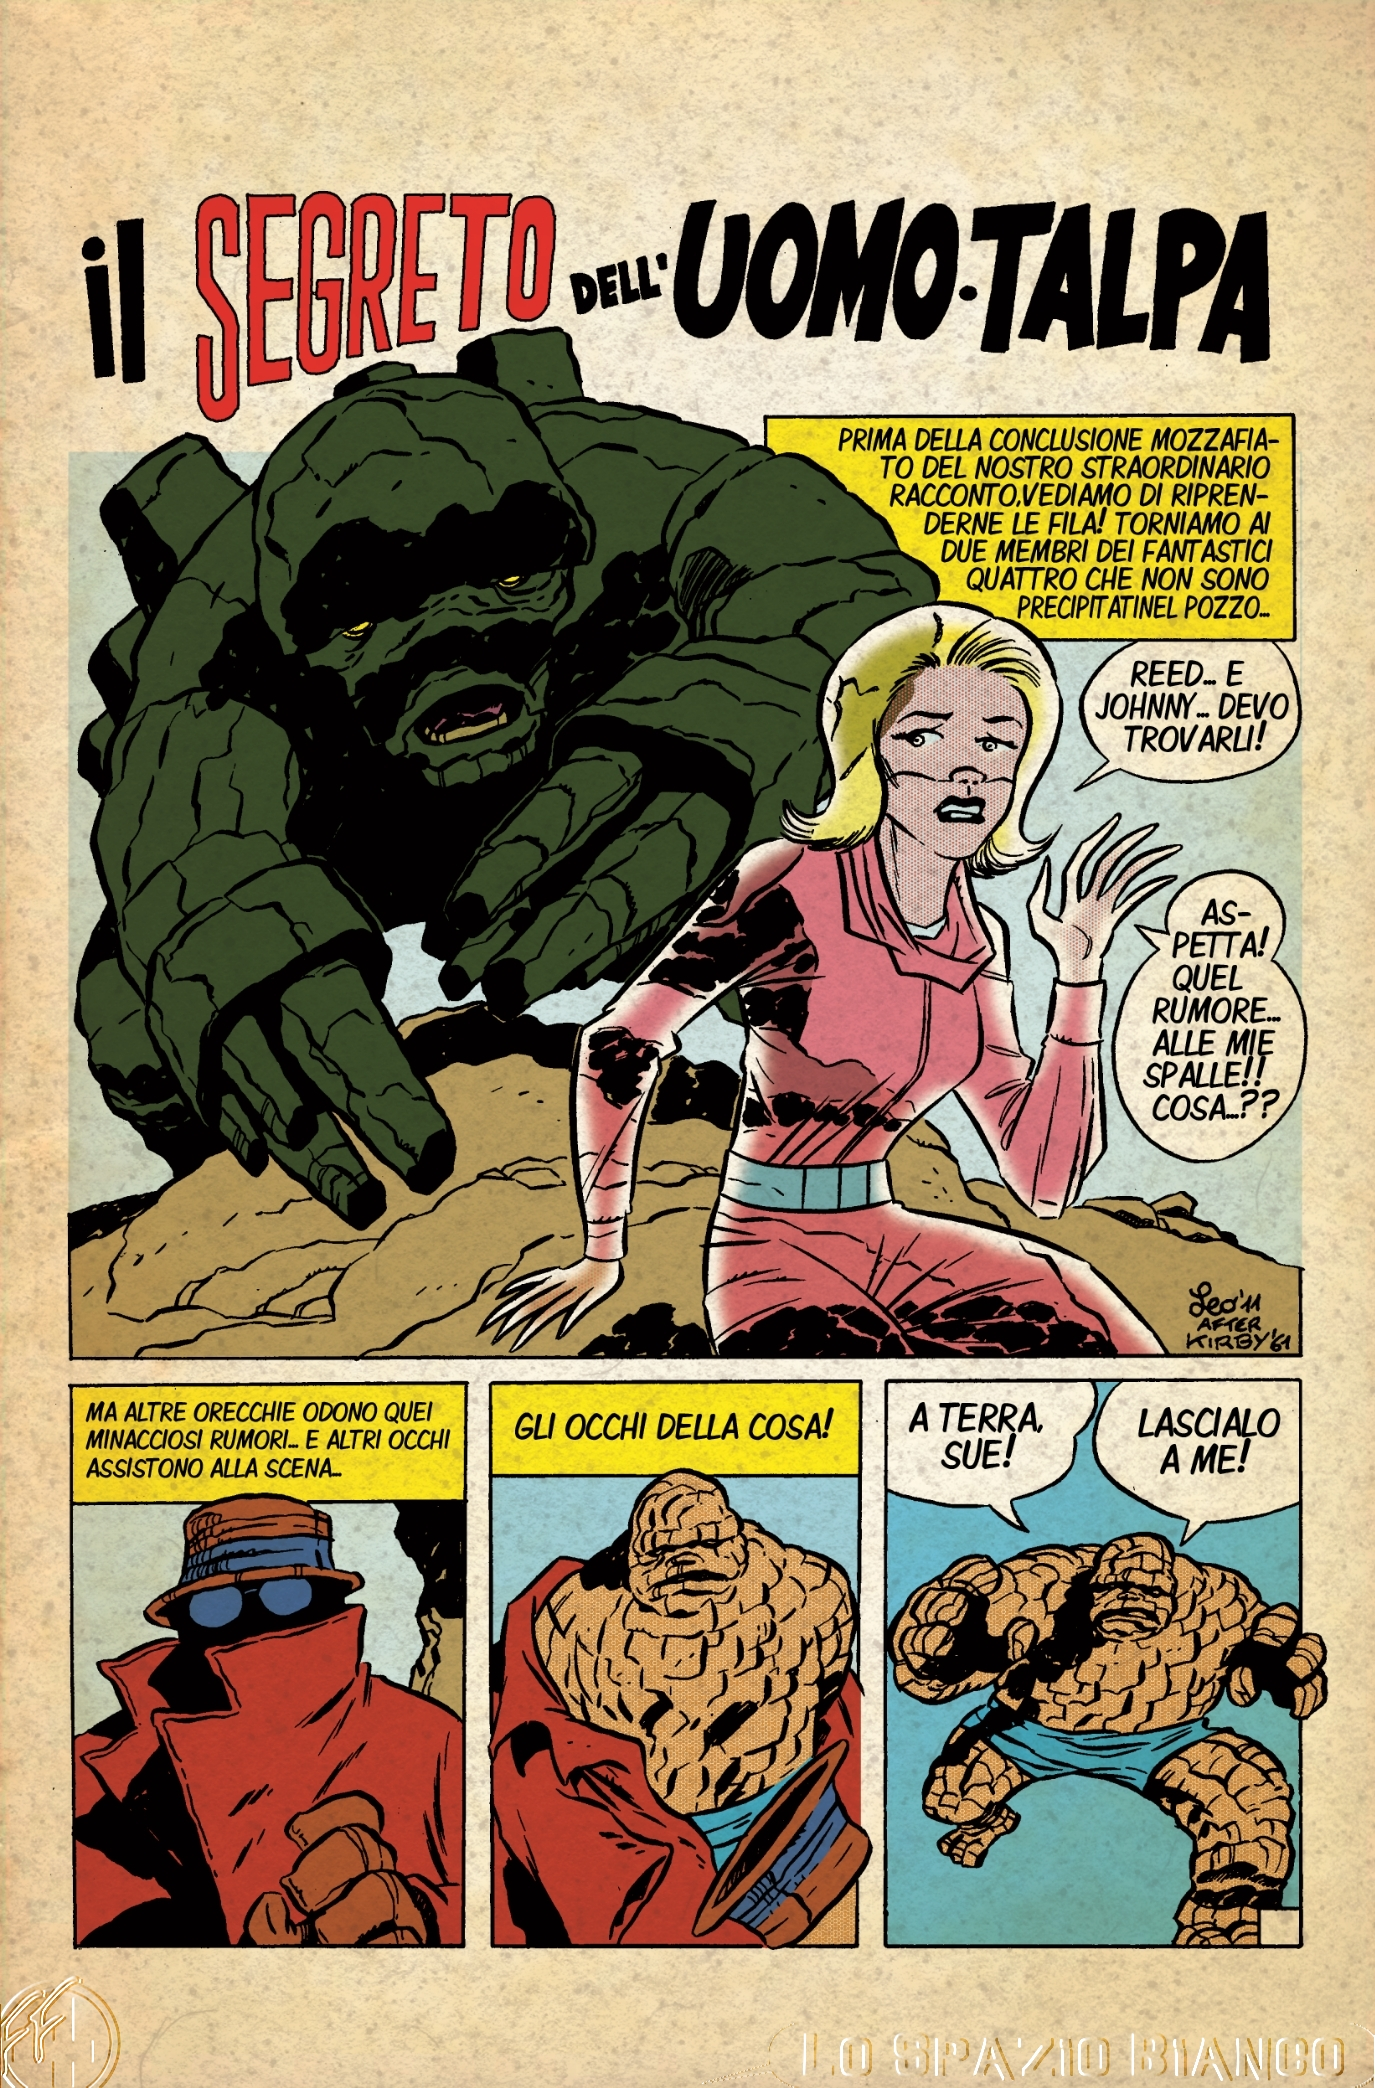 Fantastici Quattro (Mole Man 2) Pagina 1 (Leonardo Ortolani)